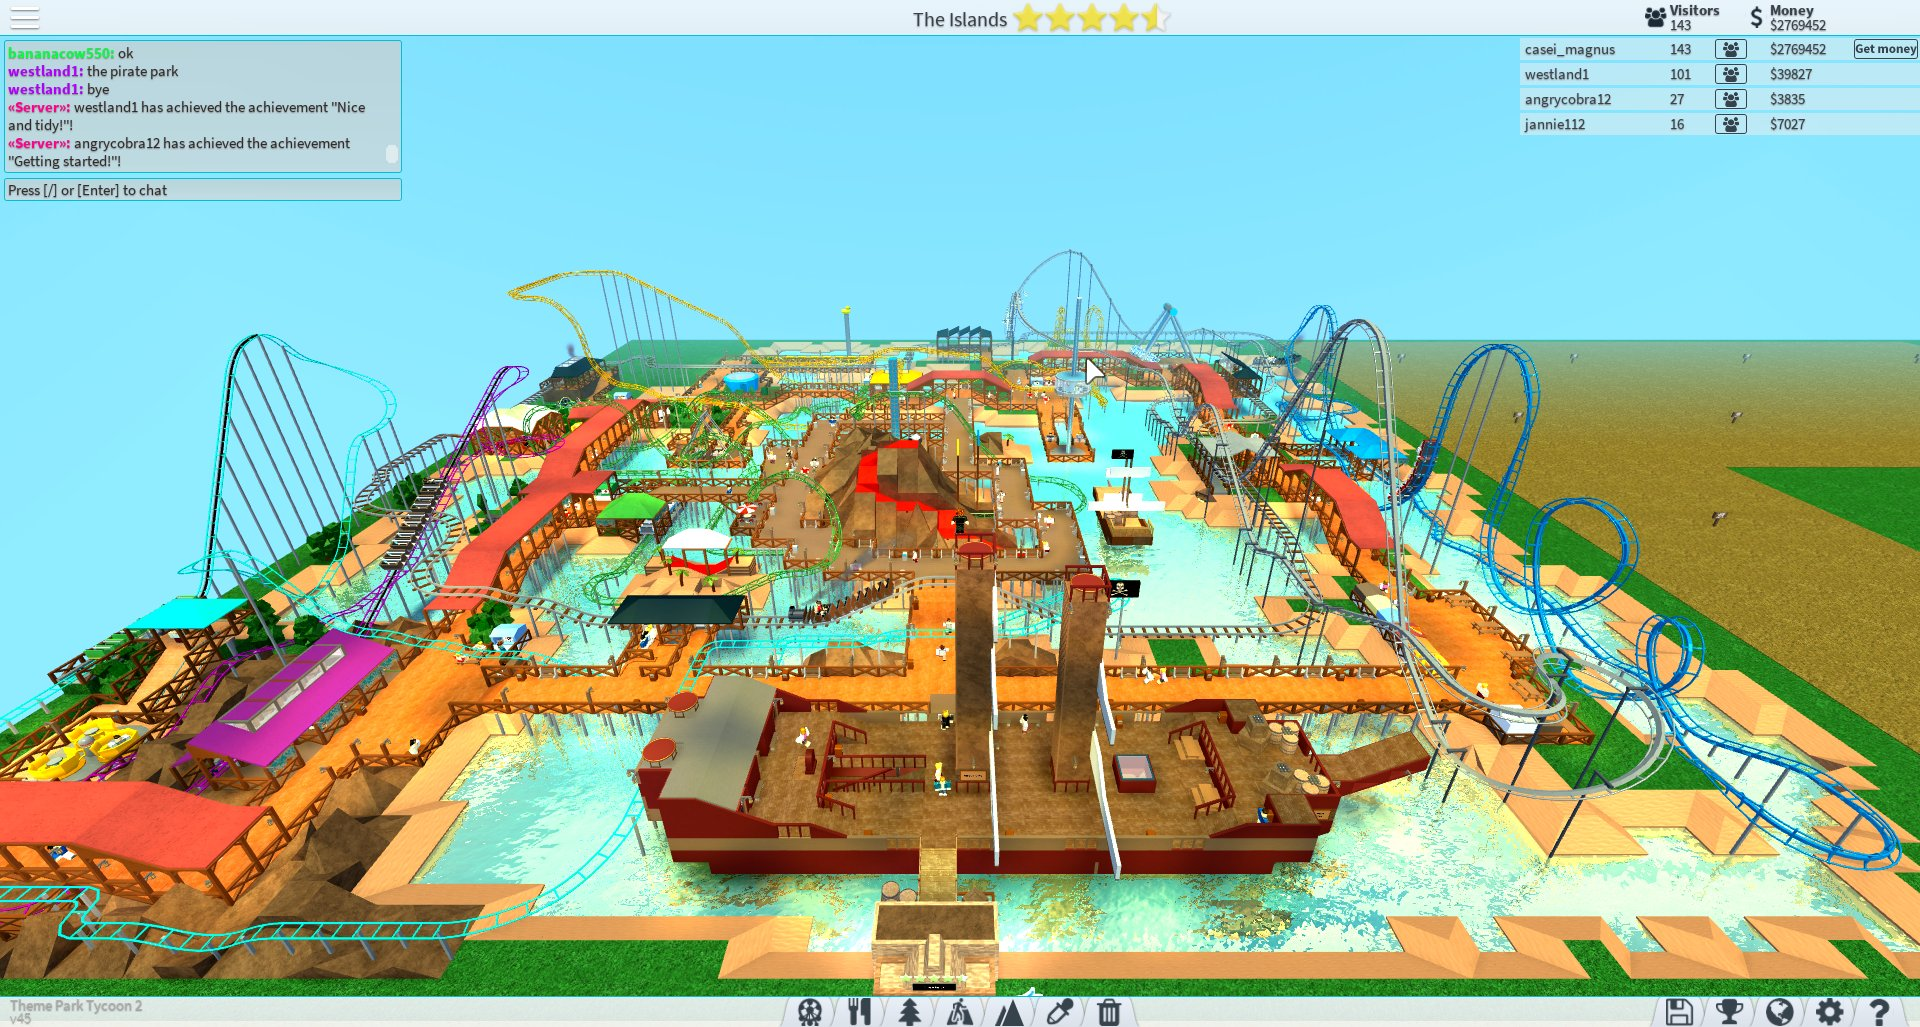 "Casei Magnus on Twitter: ""The Islands theme park ..."